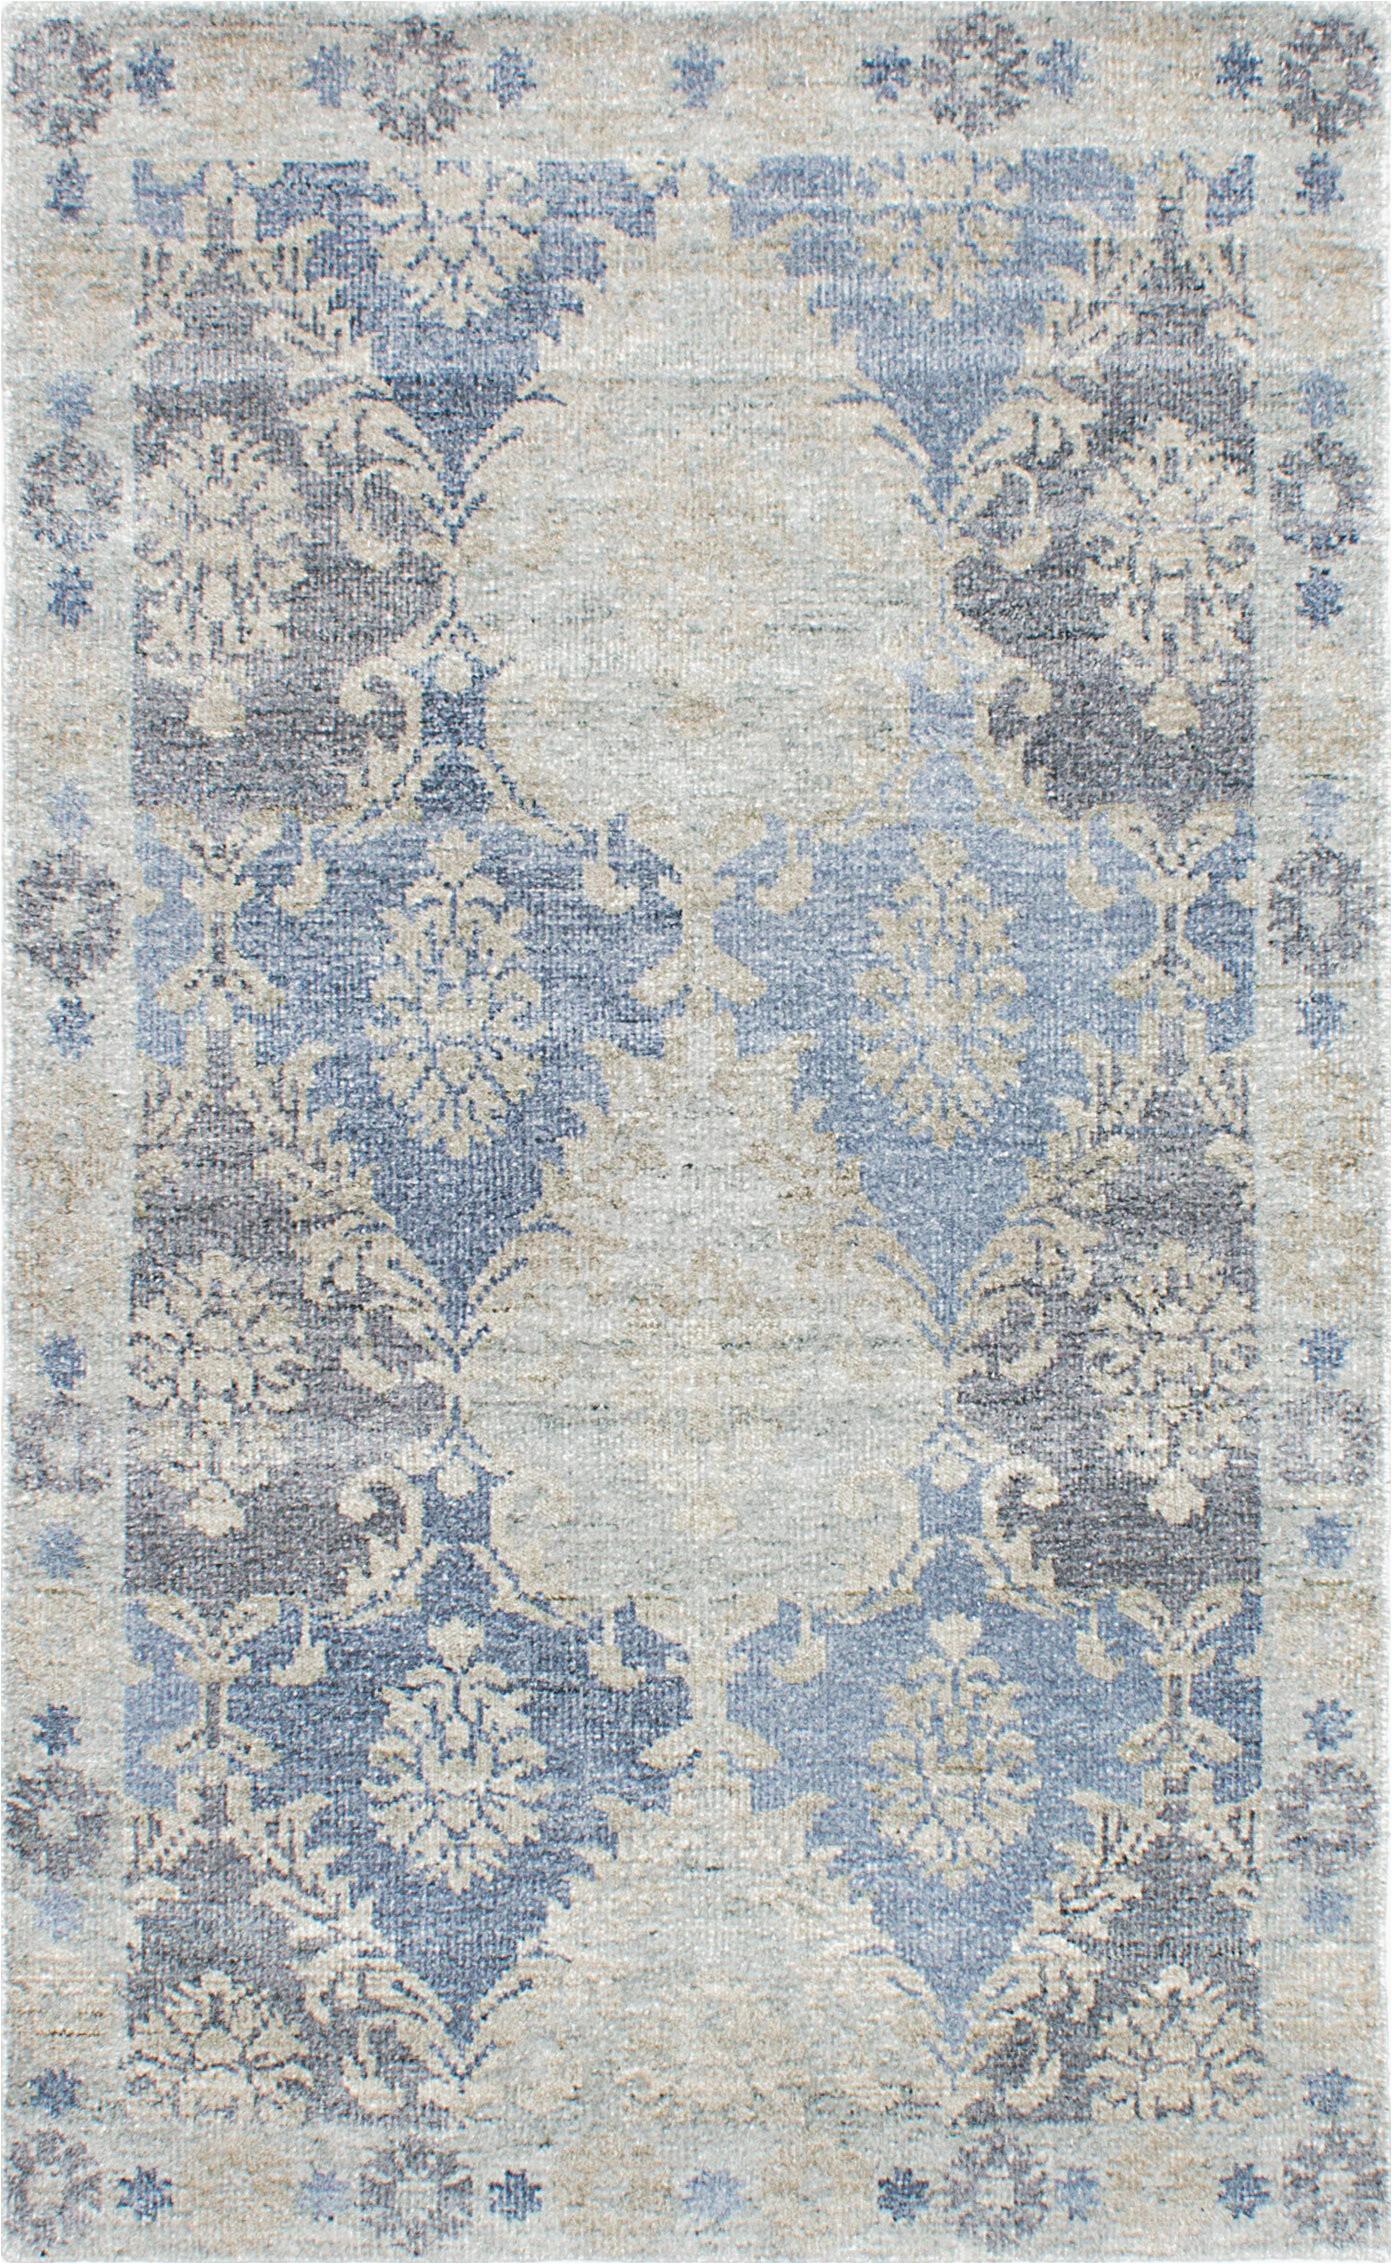 cayla oriental hand knotted silk bluebeige area rug